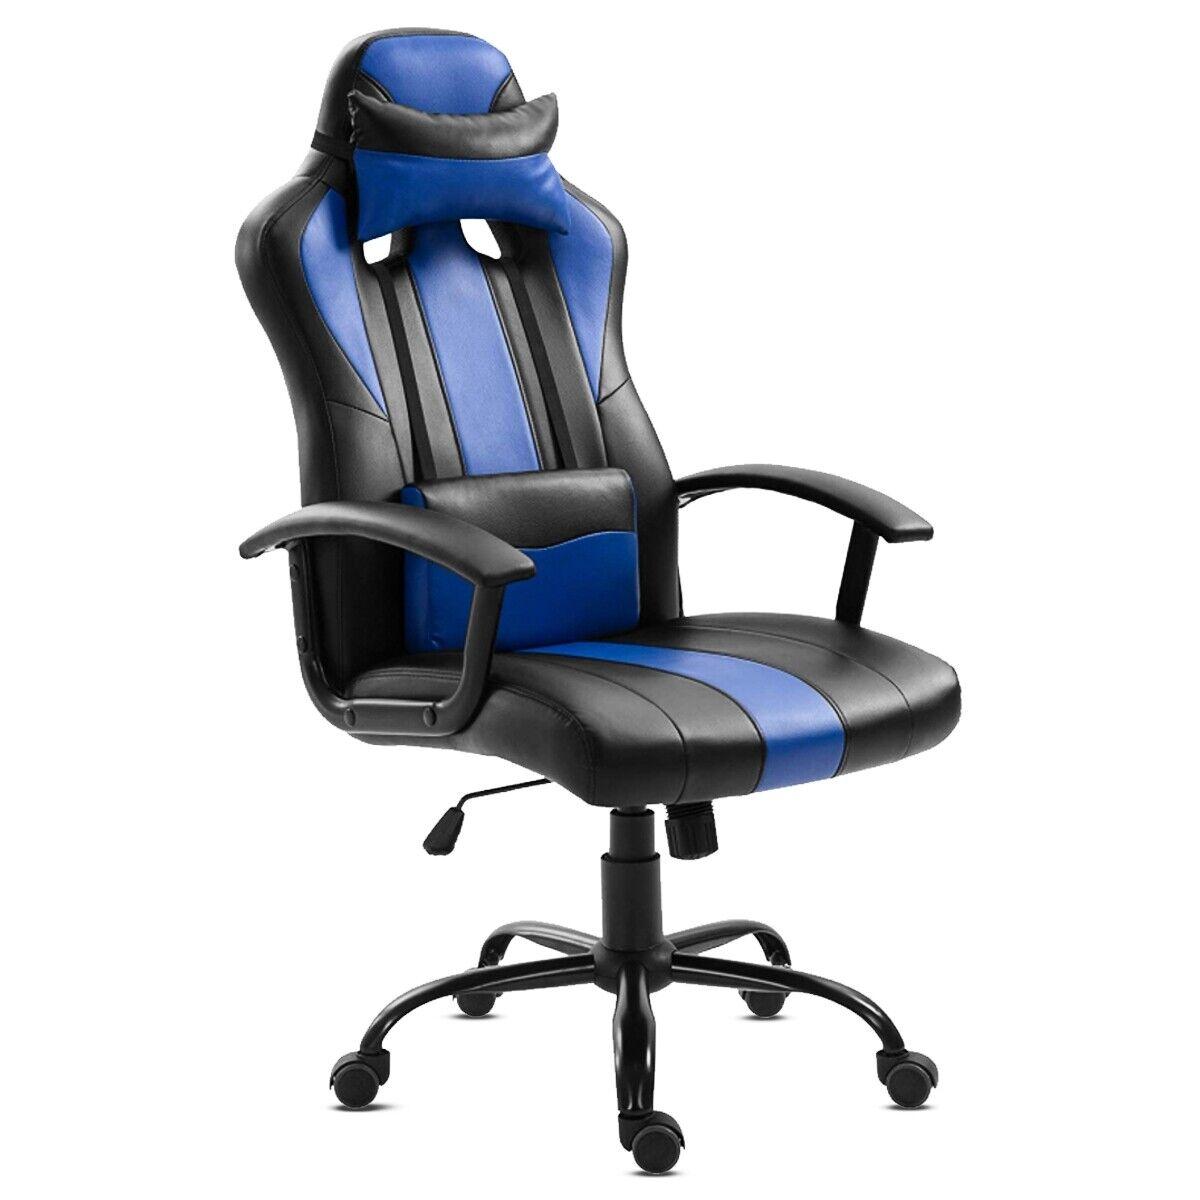 s l1600 - KEWAYES - Silla de oficina GAMER color azul deportiva ergonómica despacho gaming